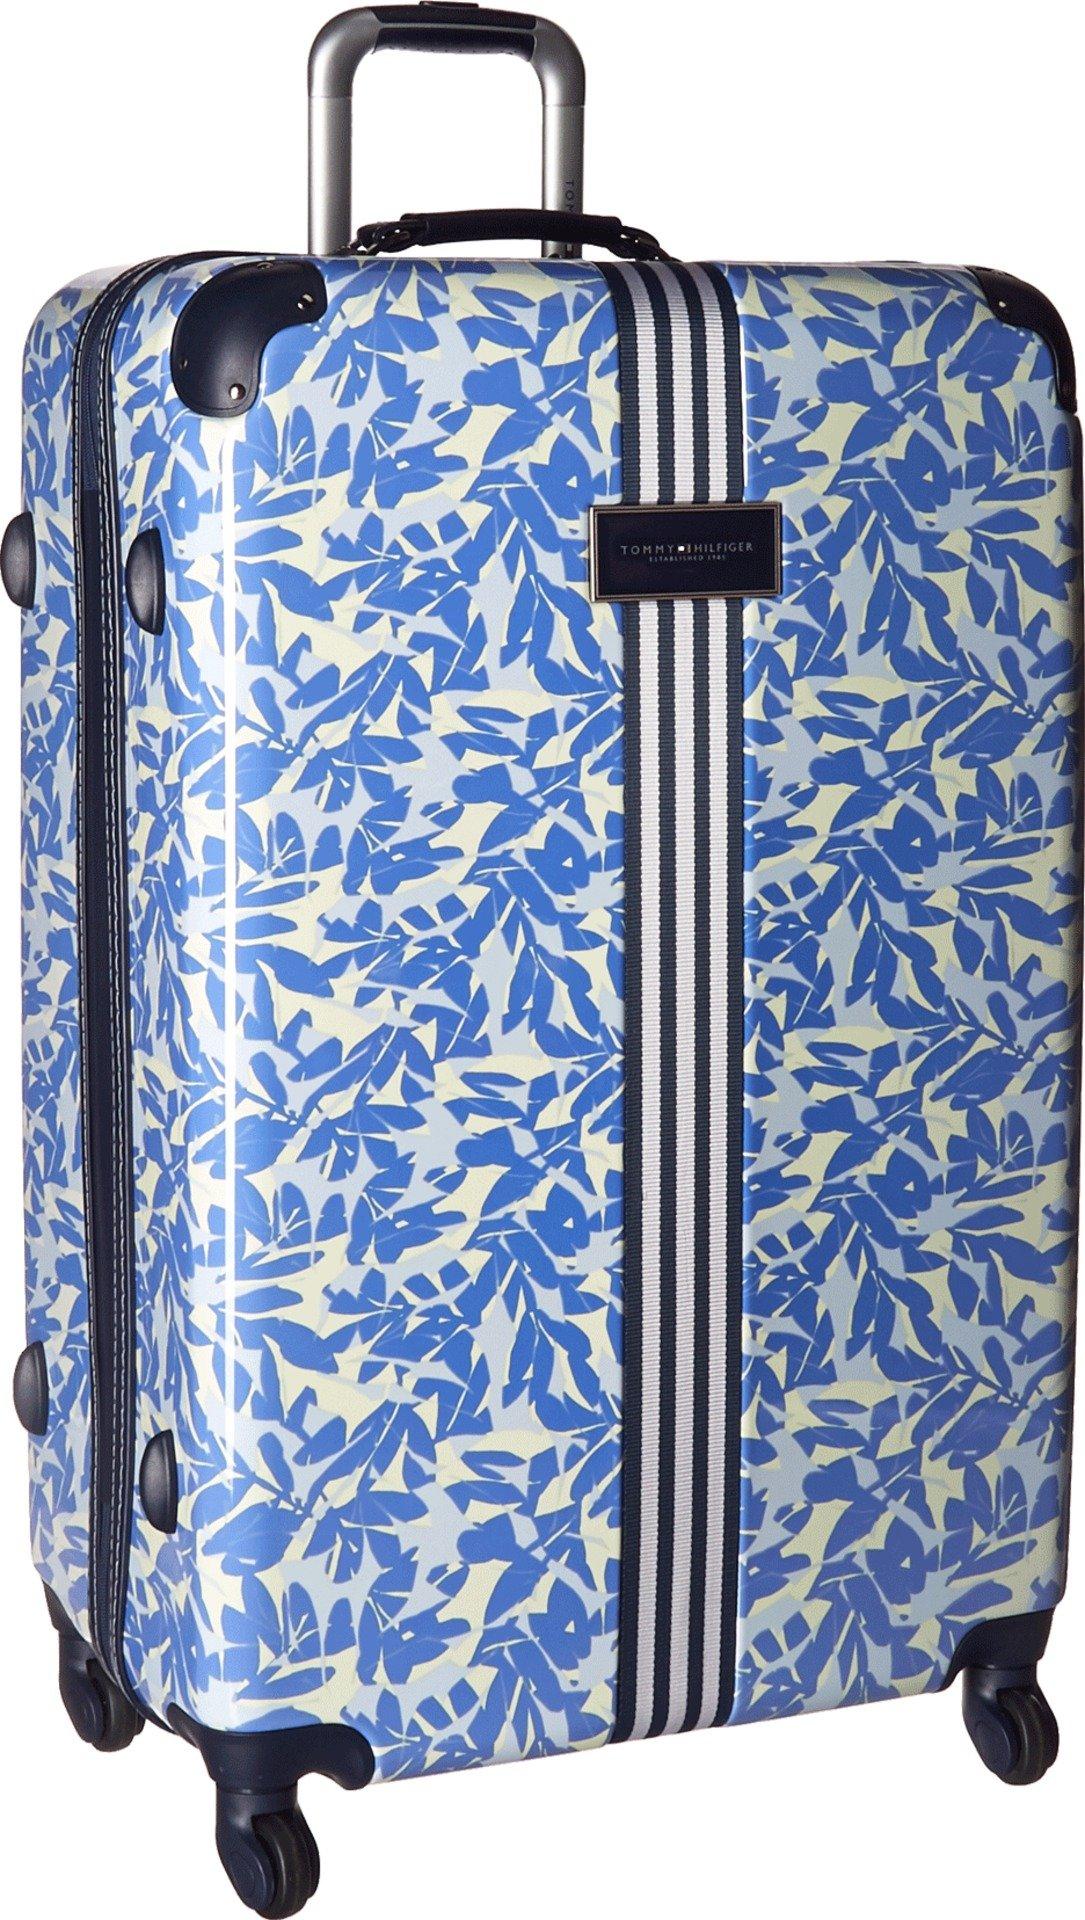 Tommy Hilfiger Unisex TH-686 Breezy Palm 29'' Upright Suitcase White One Size